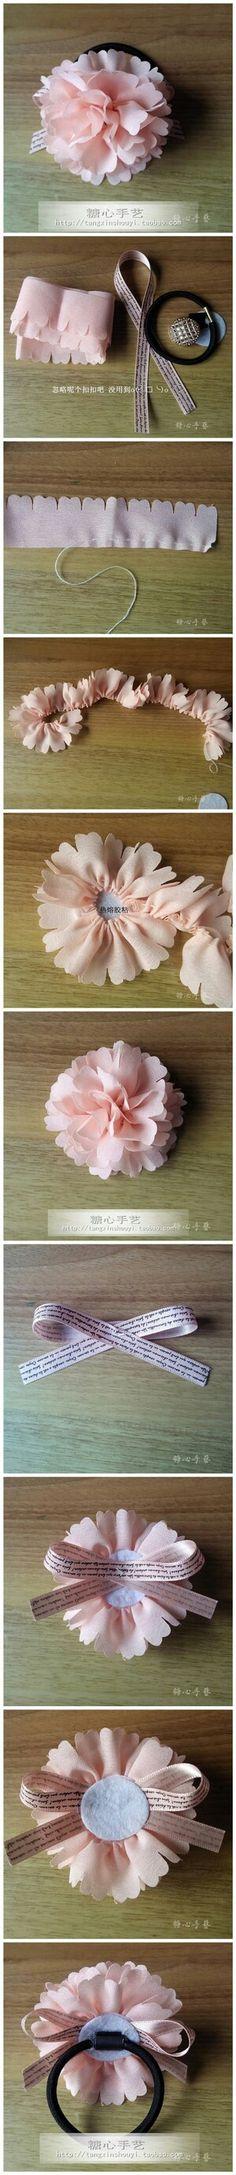 Diy Chocolate Wrapped Flower Barbie Dress Http Tagblog